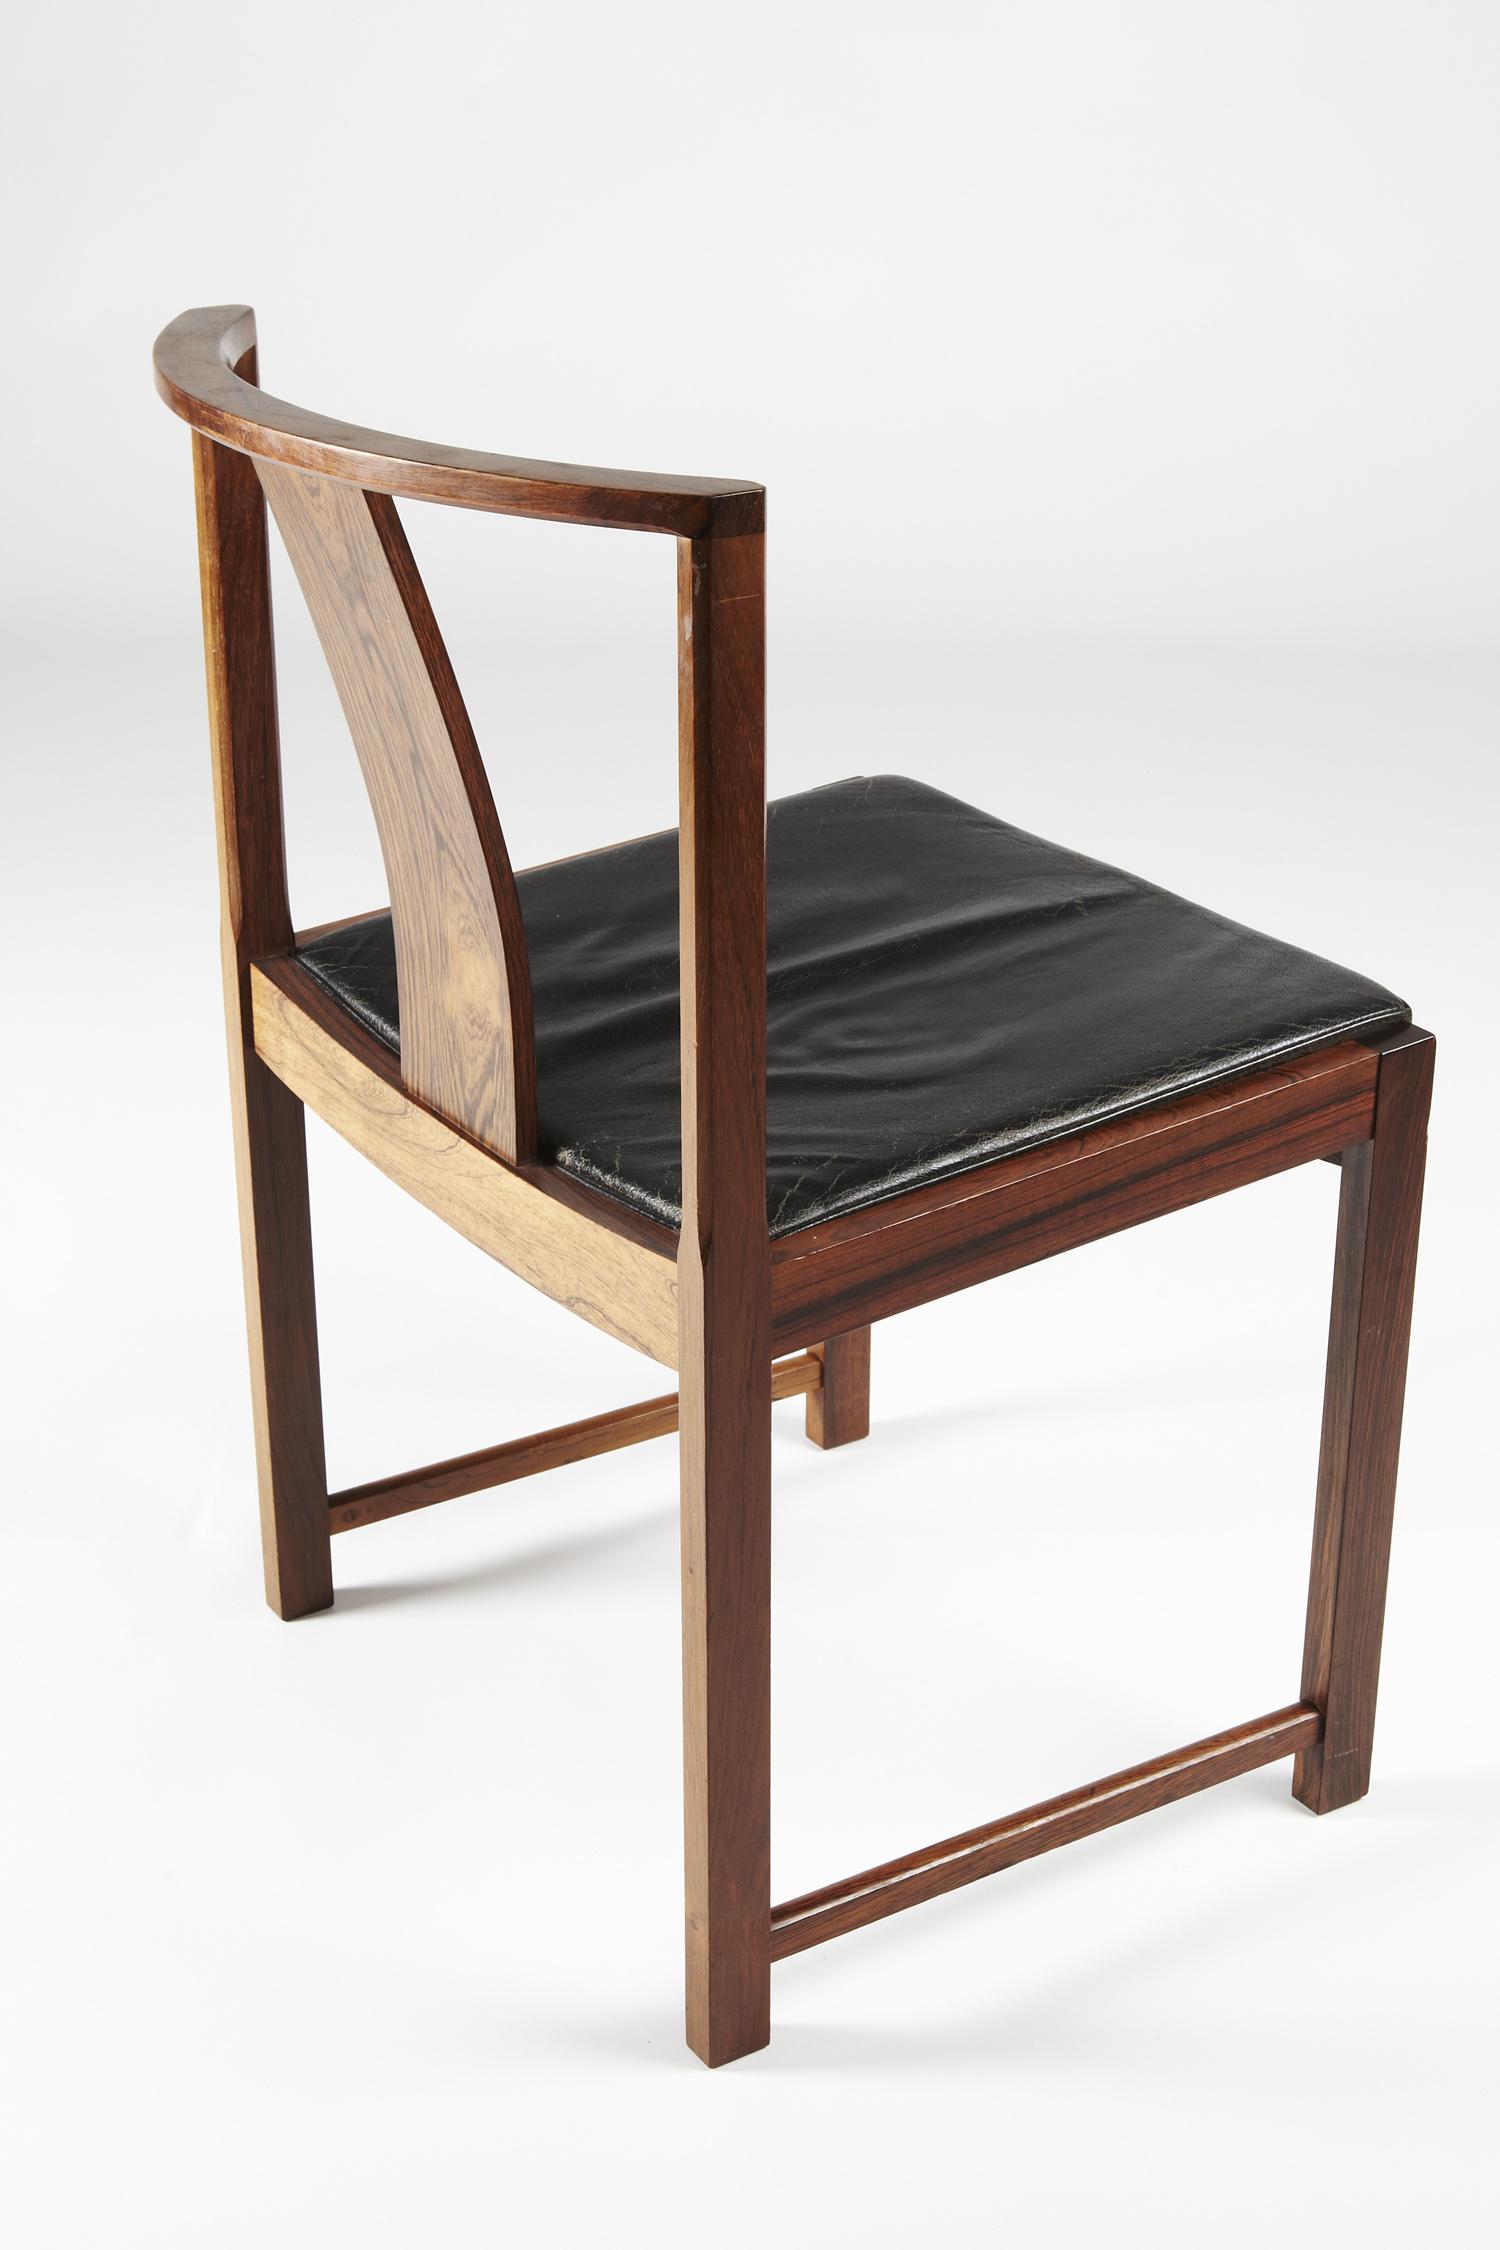 S E Rasmussen 1955 Dining Chair   • made 1955-69    •